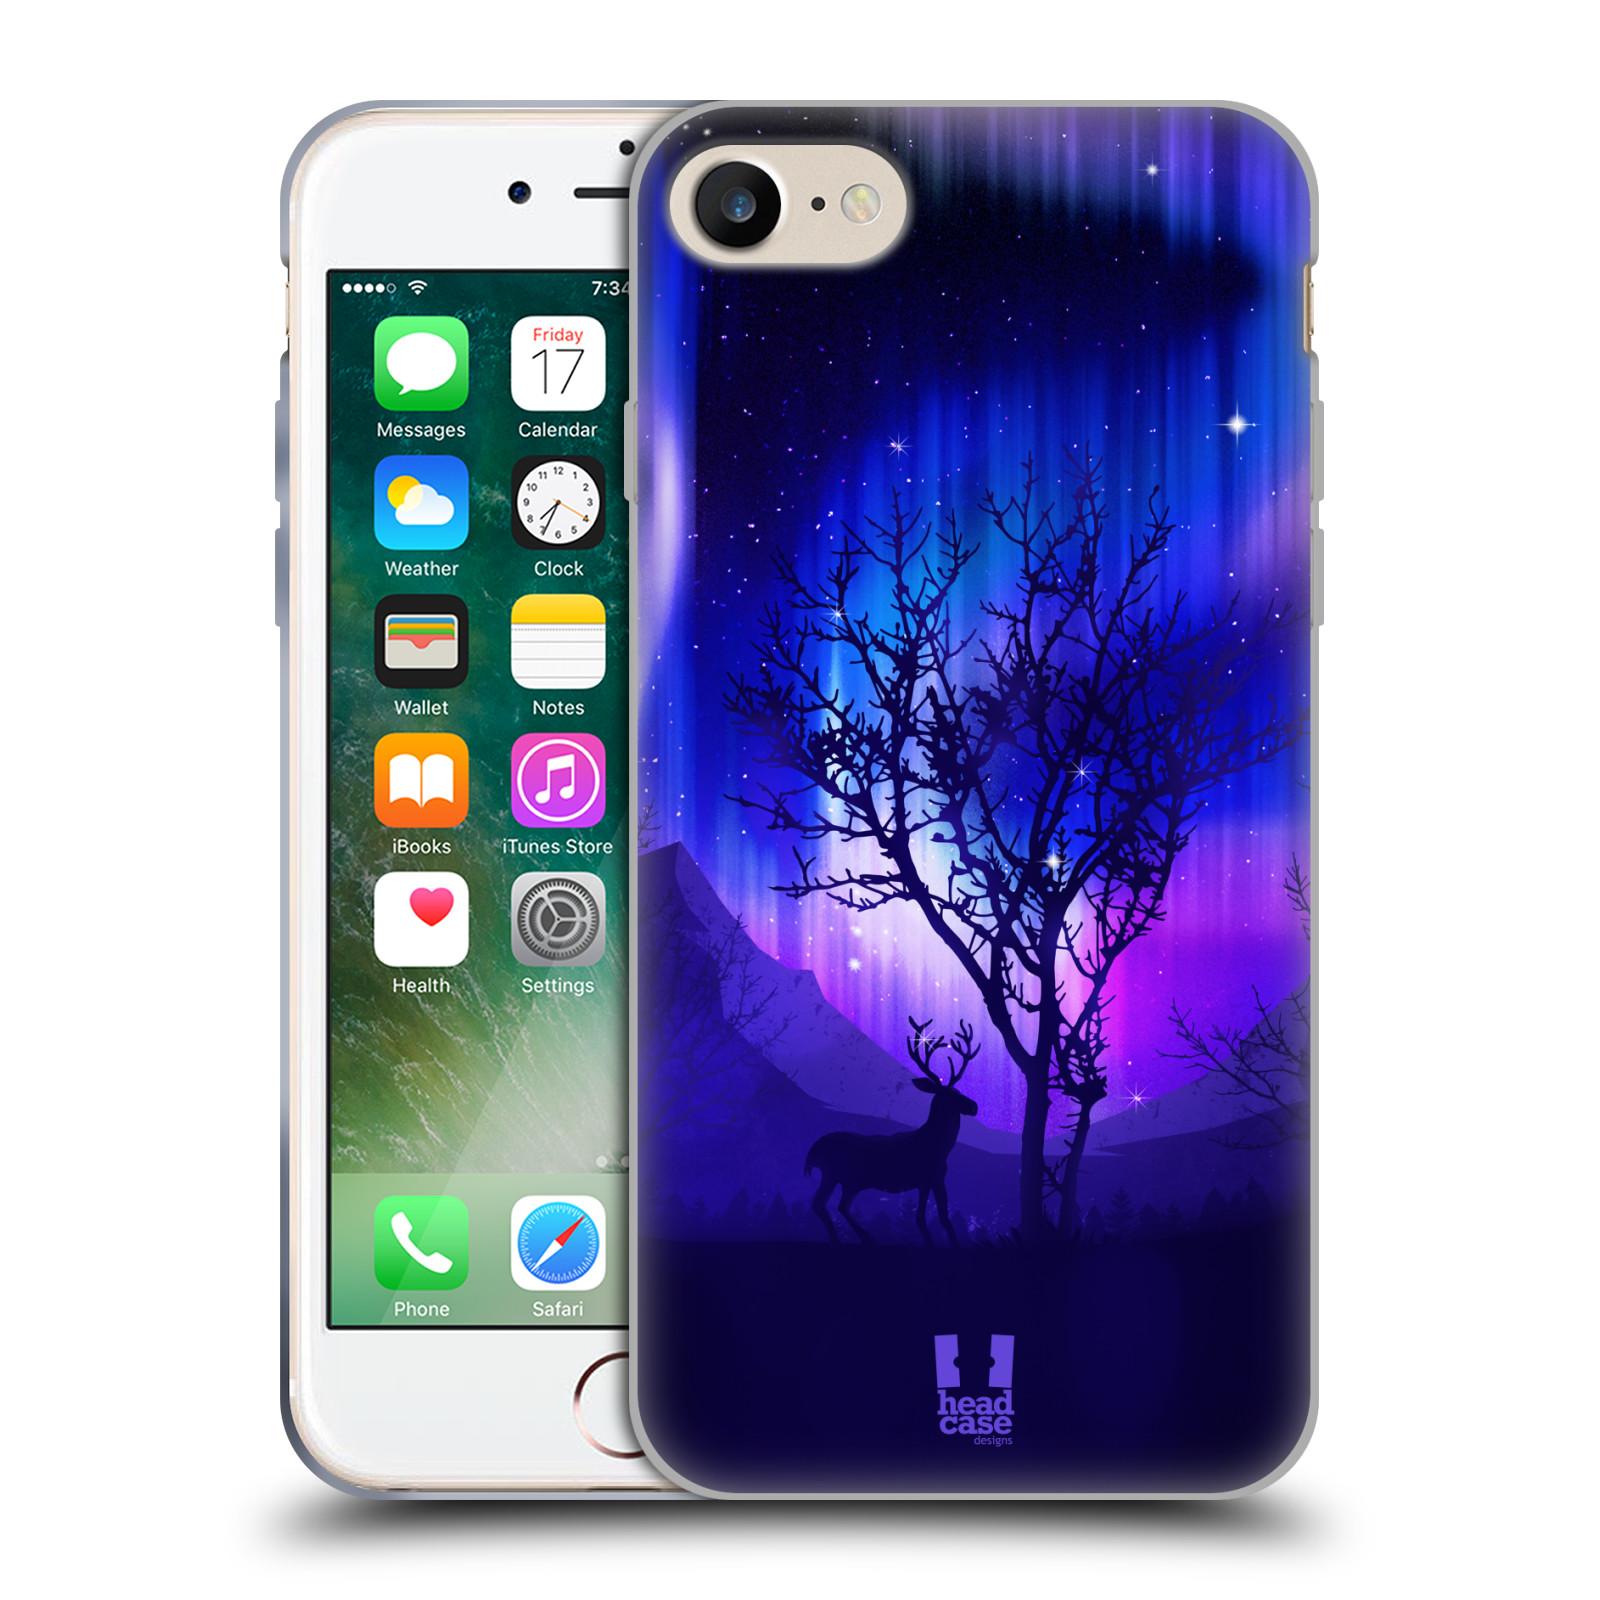 Silikonové pouzdro na mobil Apple iPhone 8 - Head Case - POLÁRNÍ ZÁŘE STROM ea67fc0a5d8